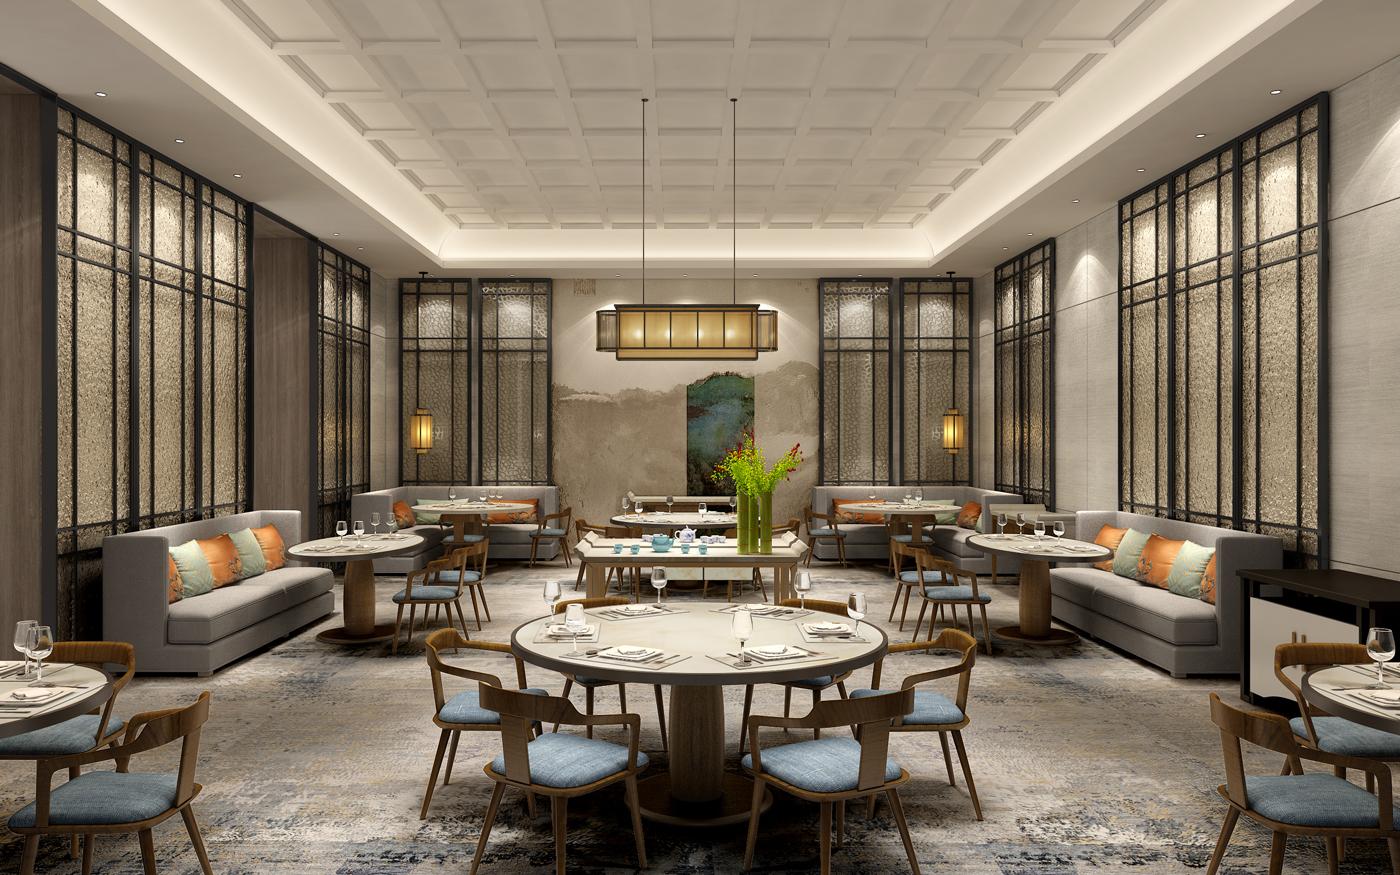 Doubletree-By-Hilton-Resort-_web_7